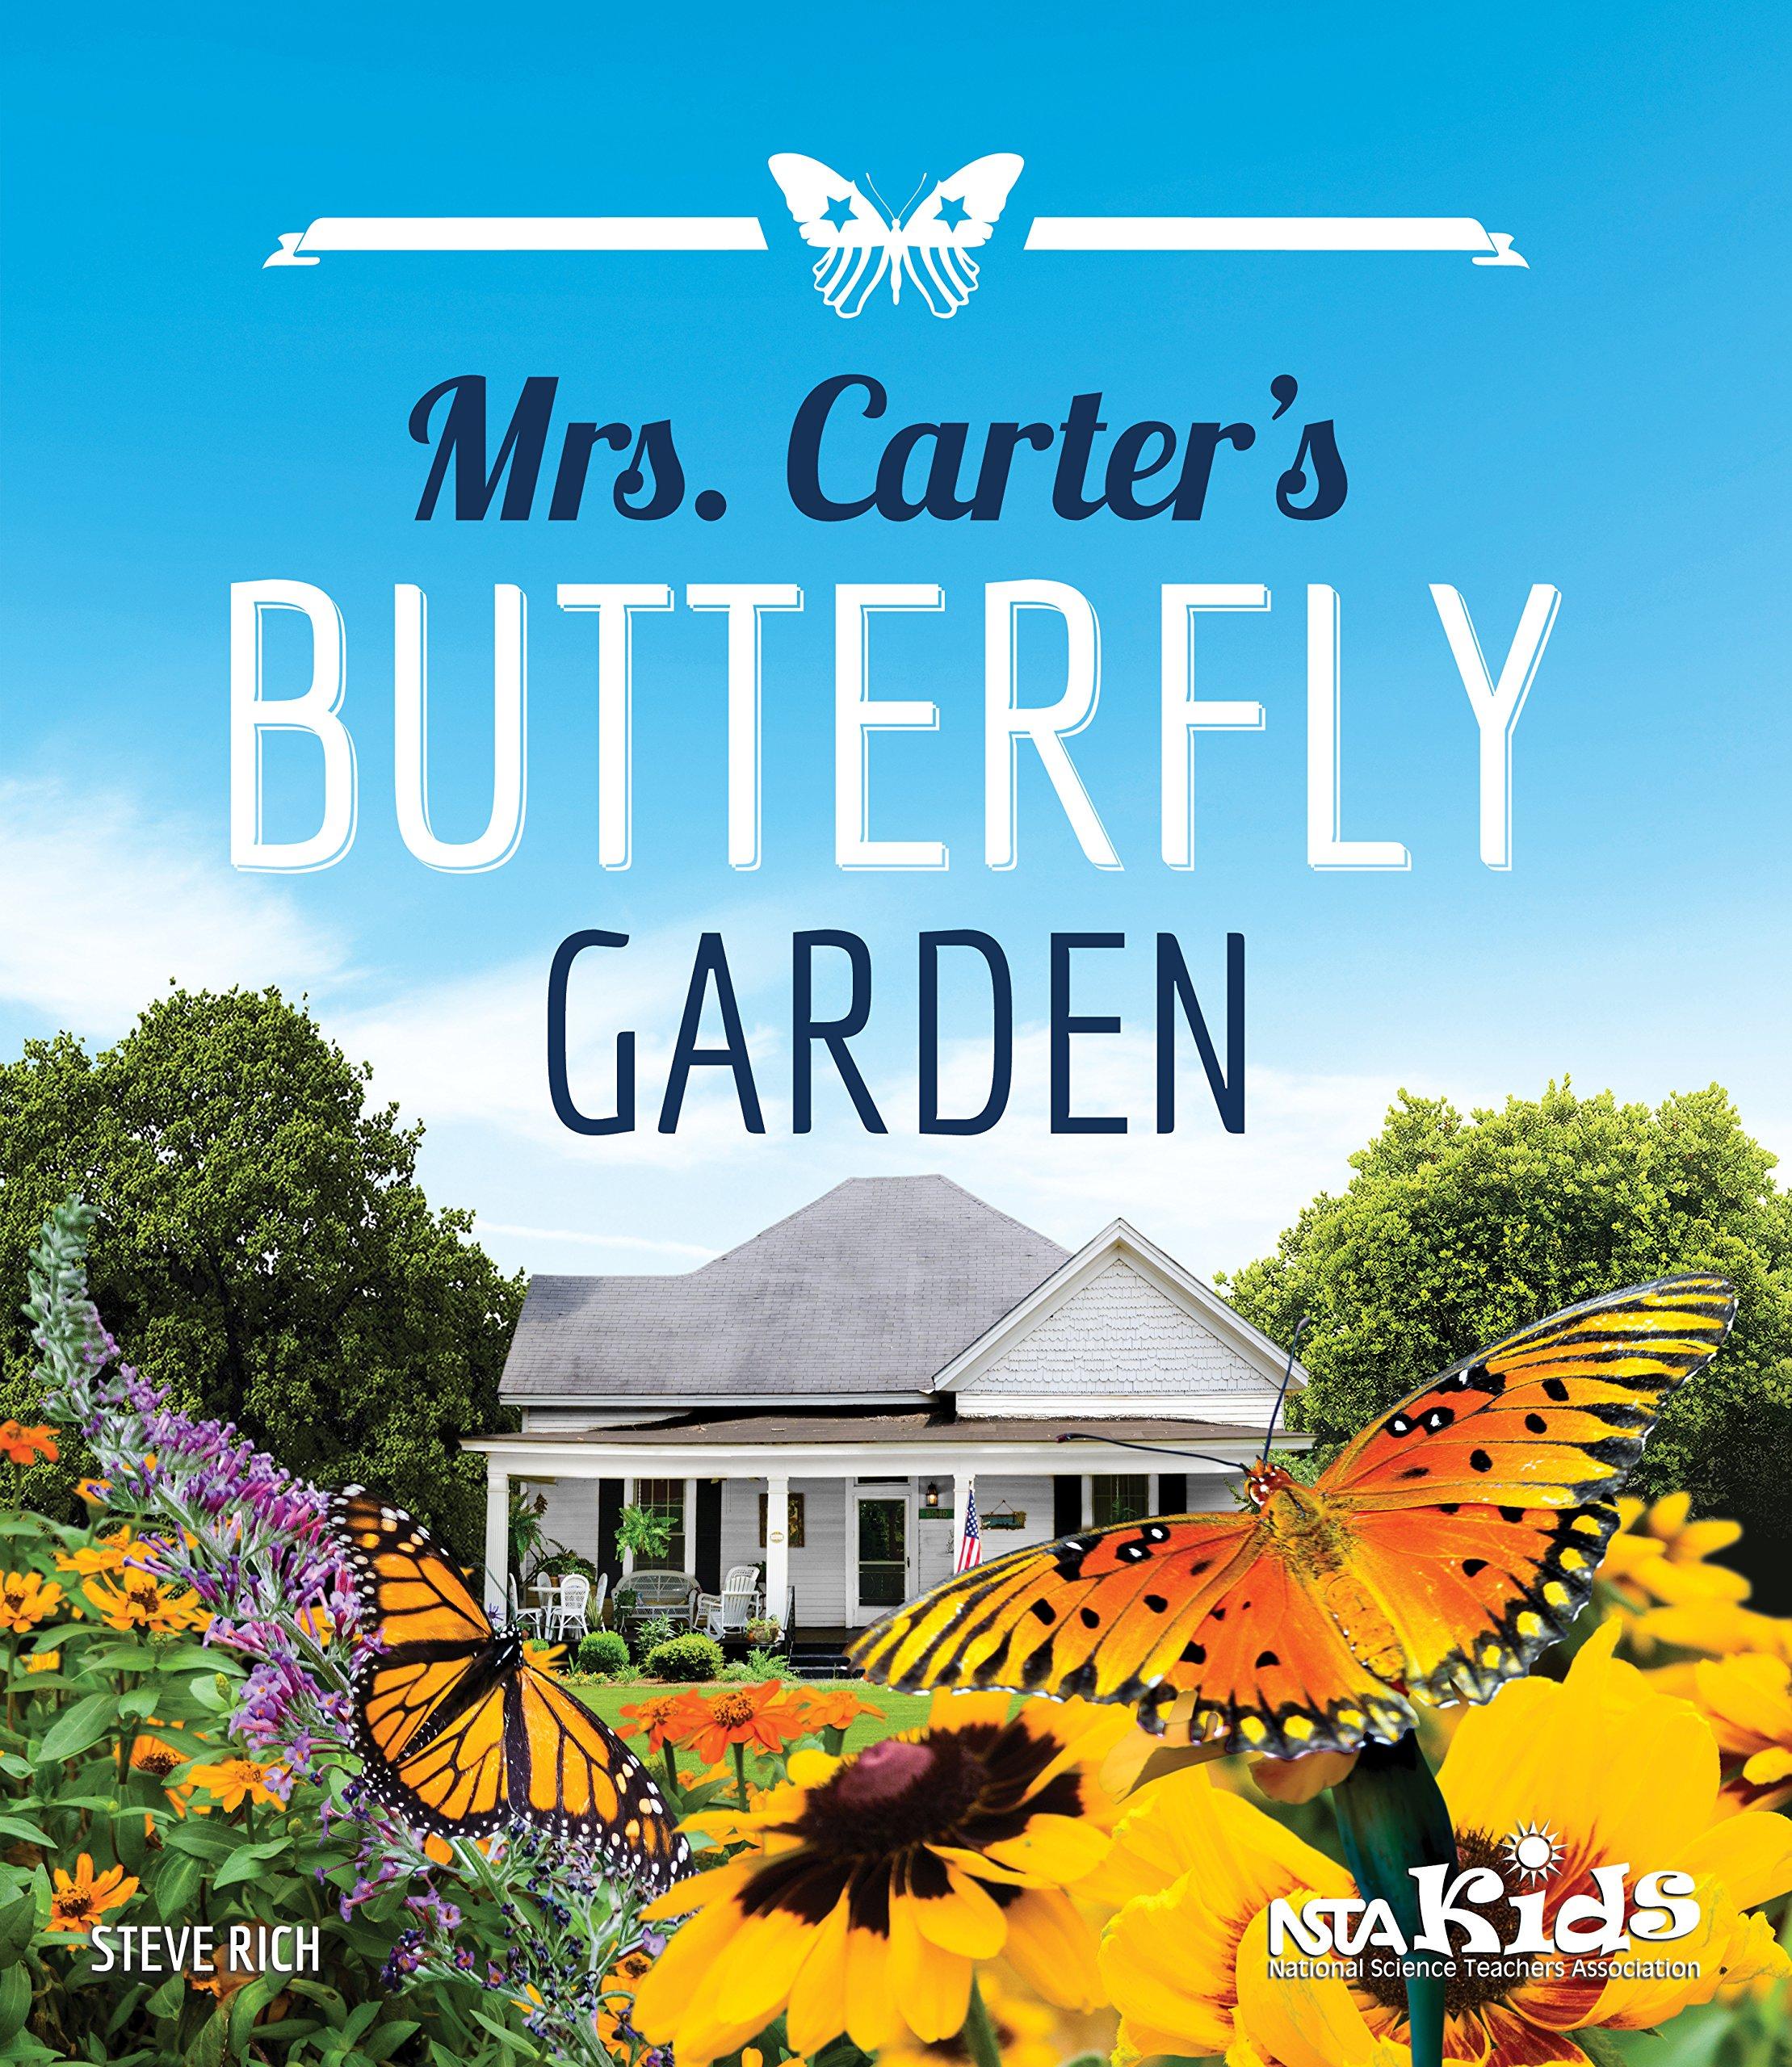 mrs carters butterfly garden steve rich 9781941316085 amazoncom books - Butterfly Garden Book